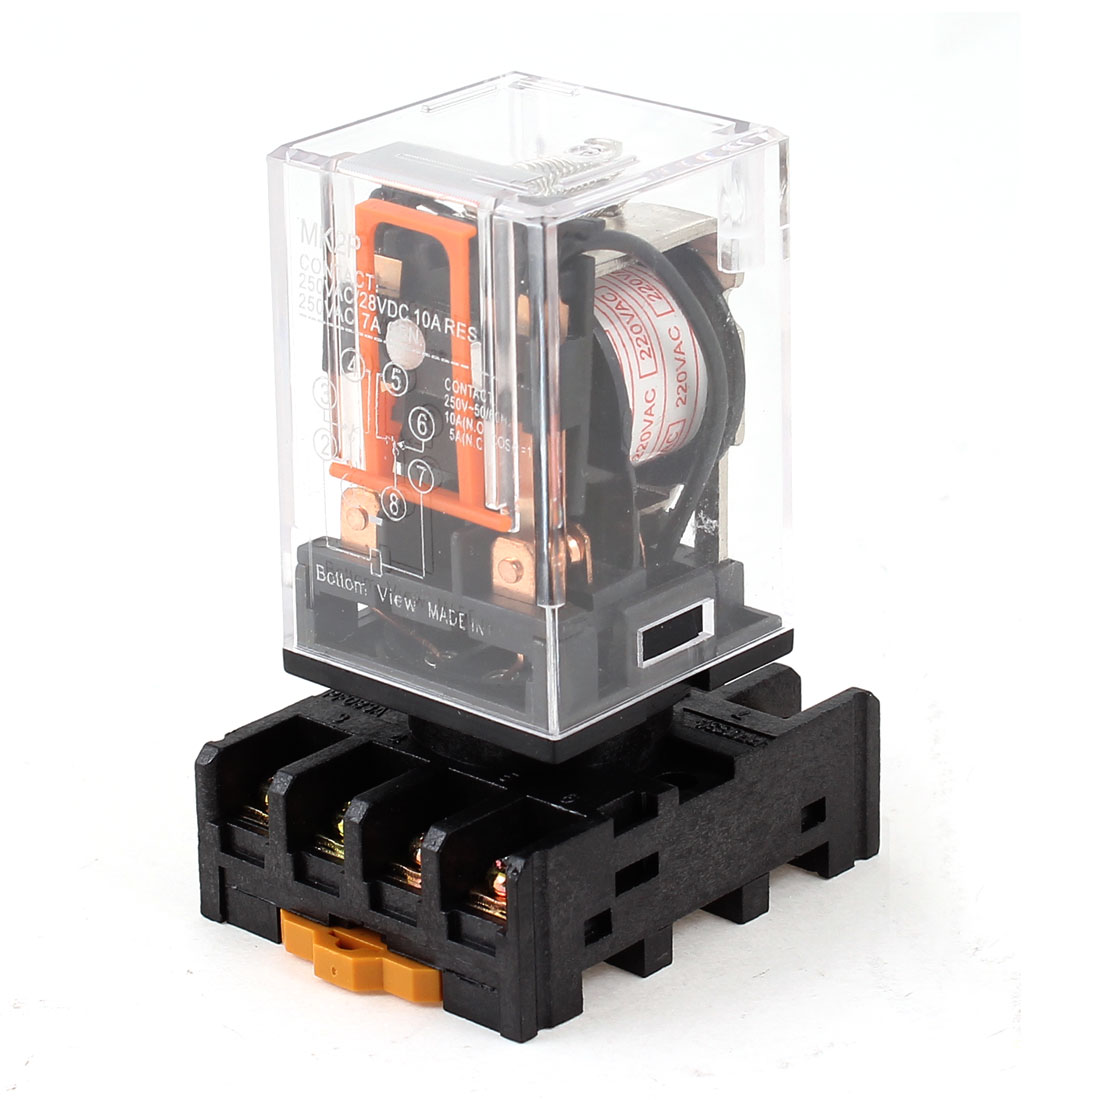 MK2P AC 220V 8 Pins DPDT Coil Power Relay w 35mm DIN Rail Socket